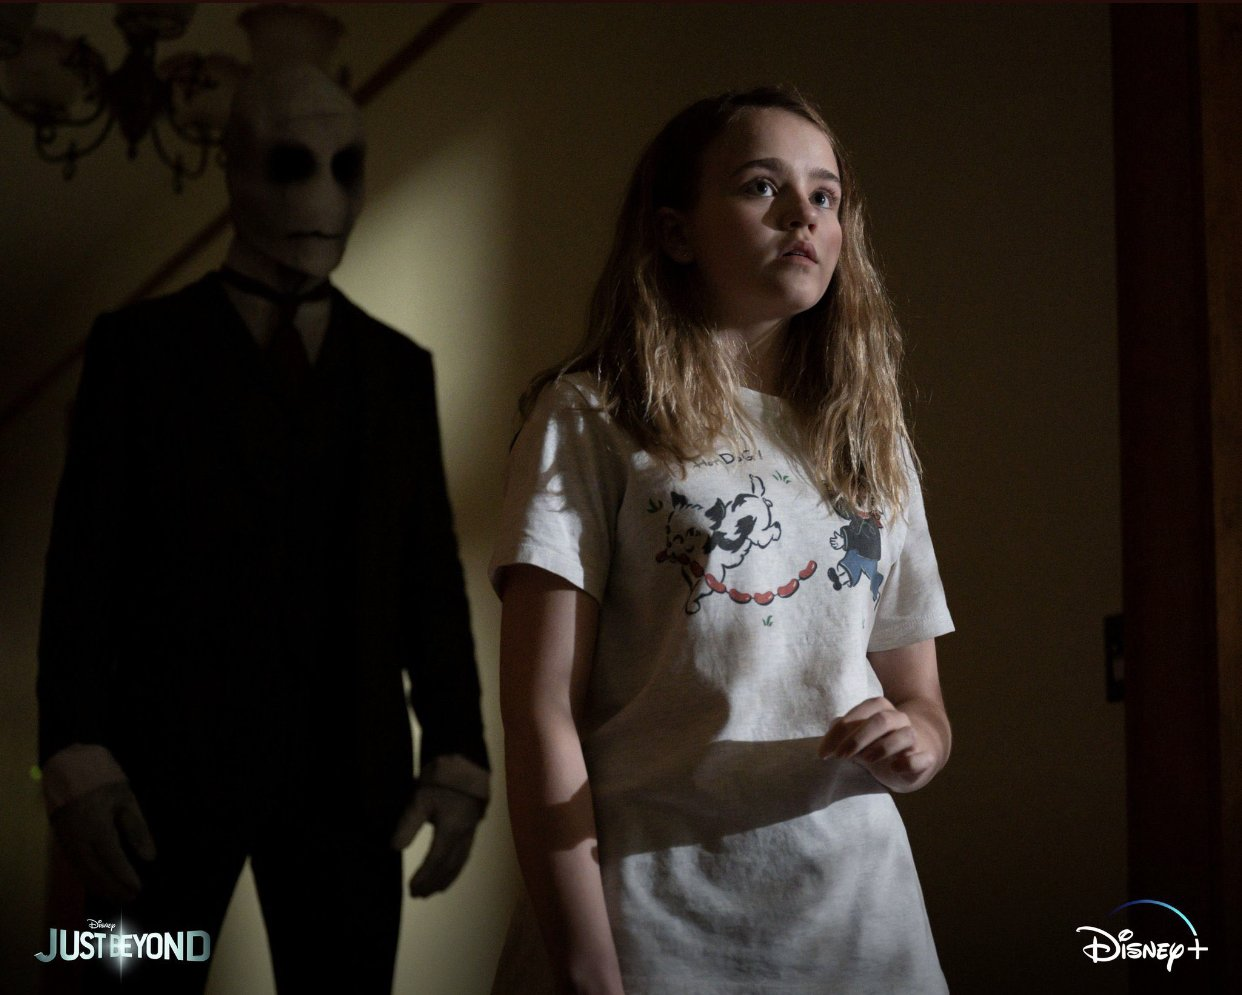 Just Beyond Disney